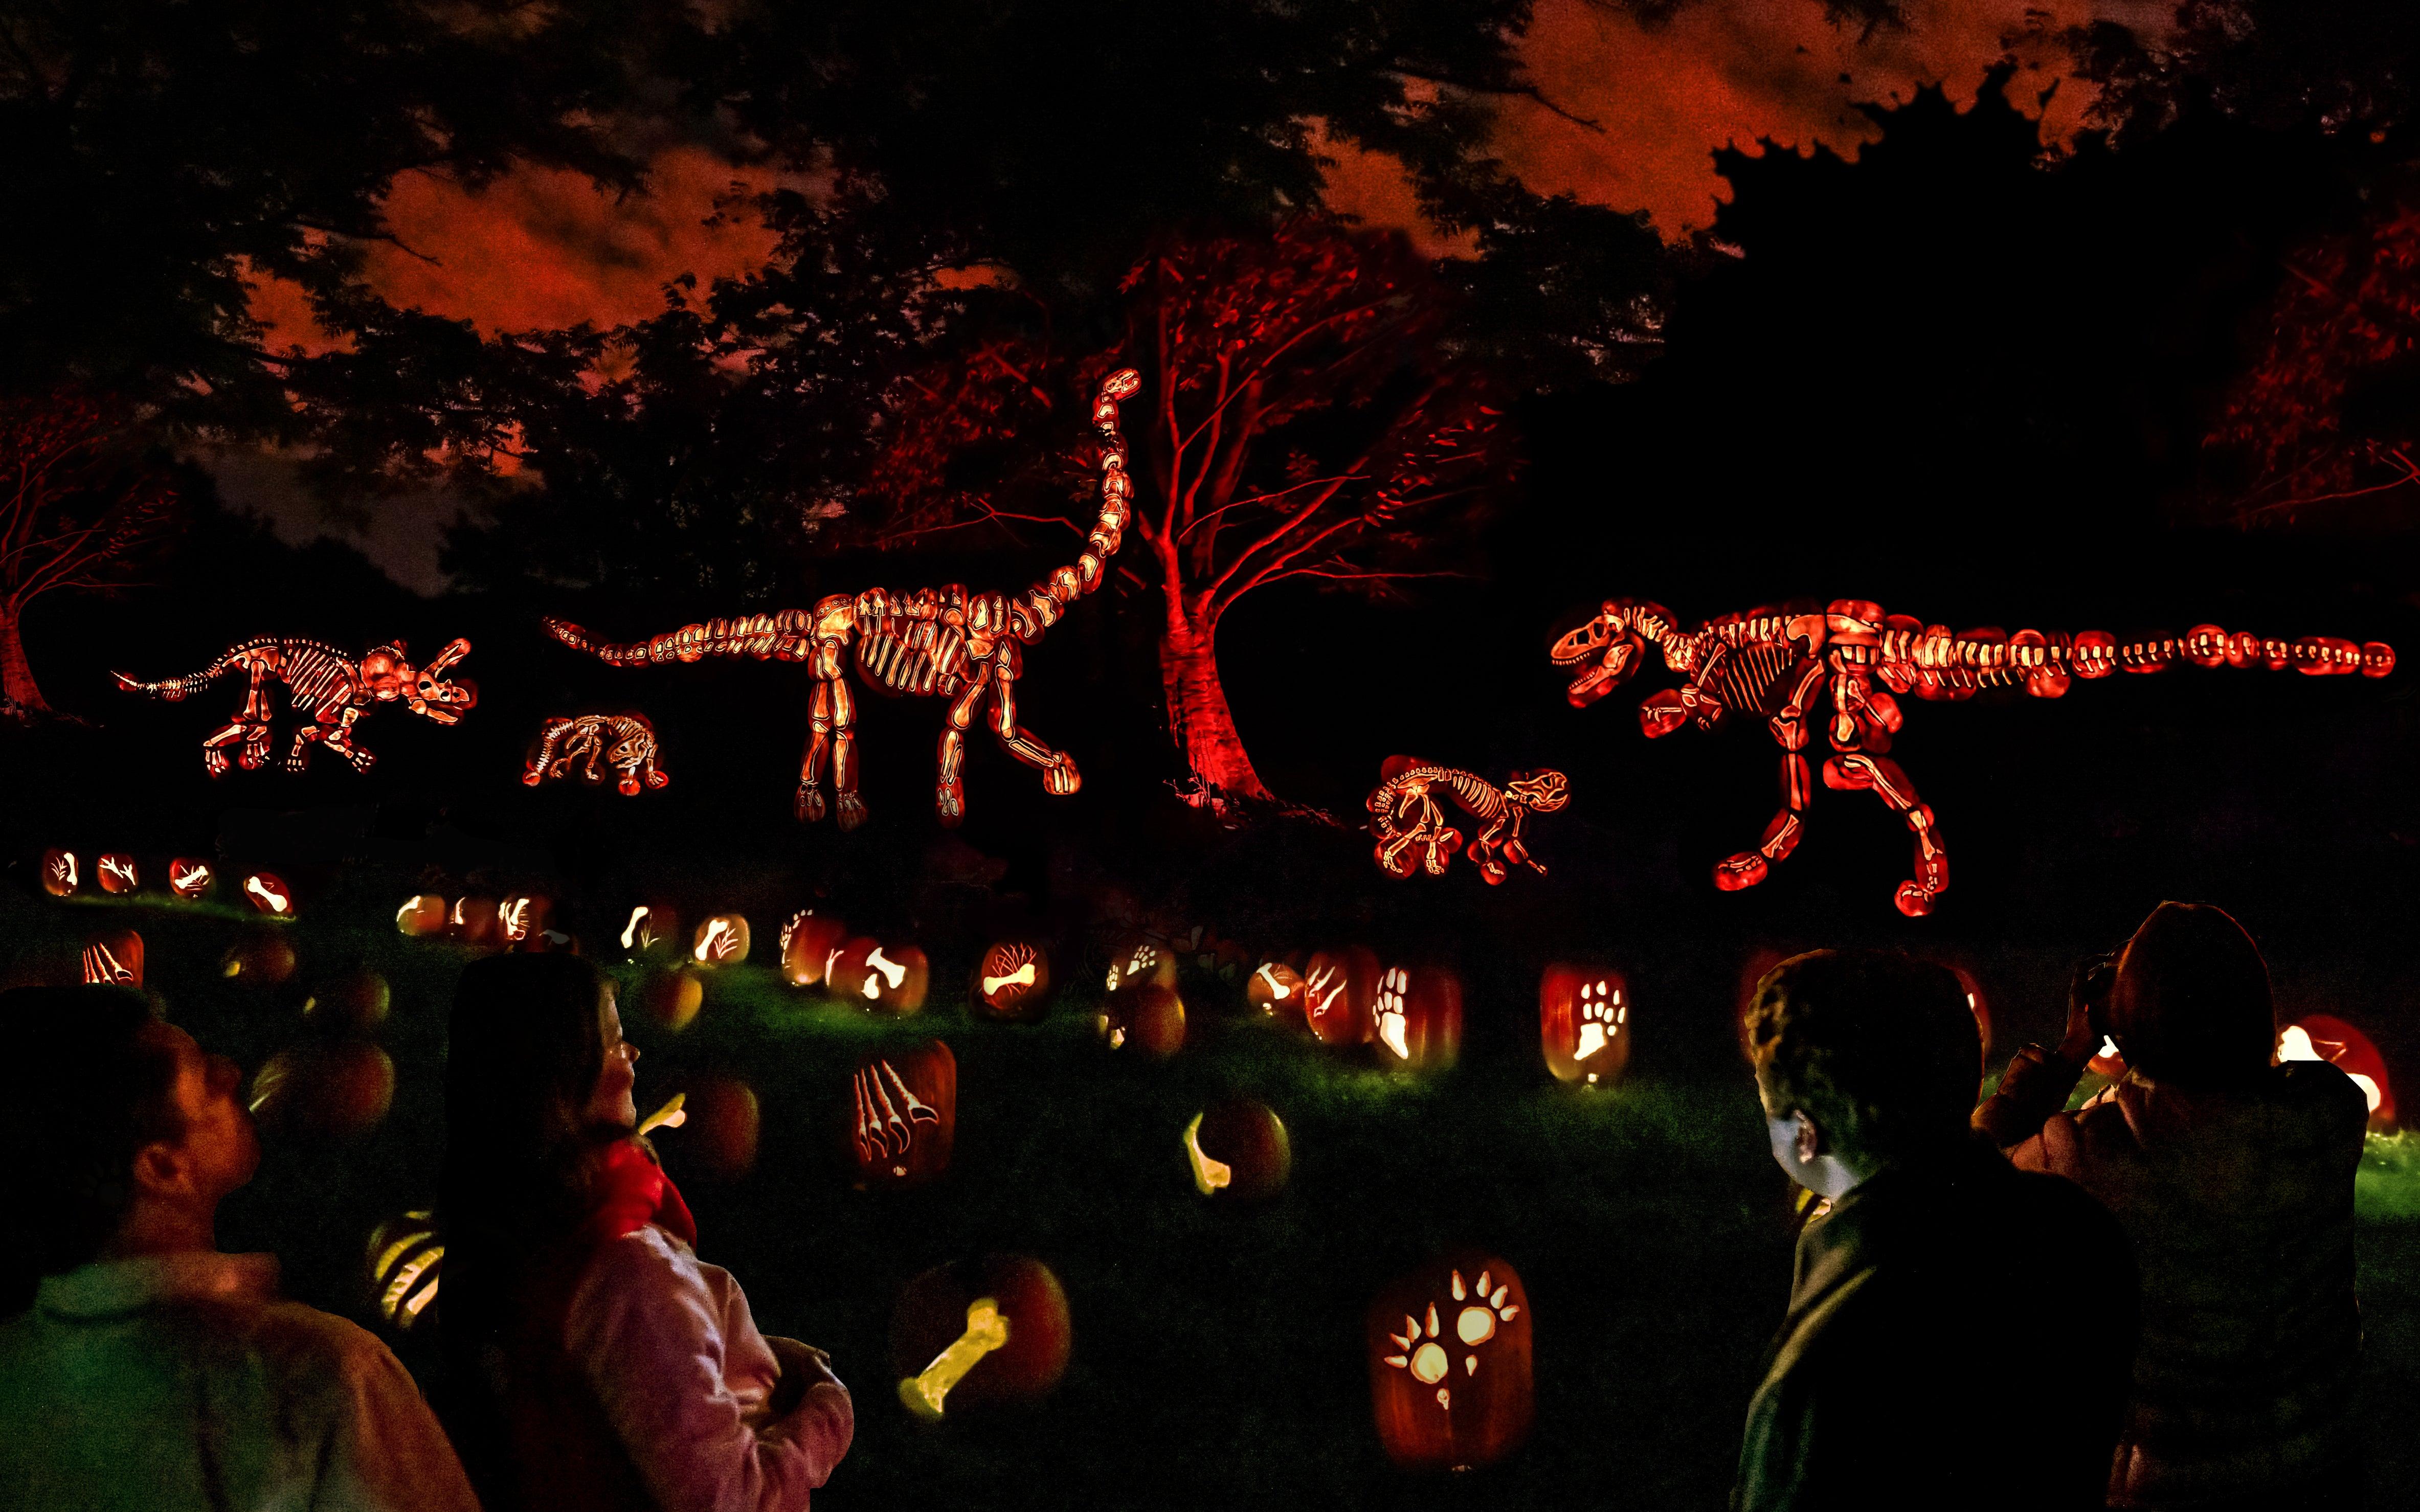 Halloween 2020 Franklin Park Ma At Franklin Park Zoo, see Jack O' Lantern Journey, thousands of